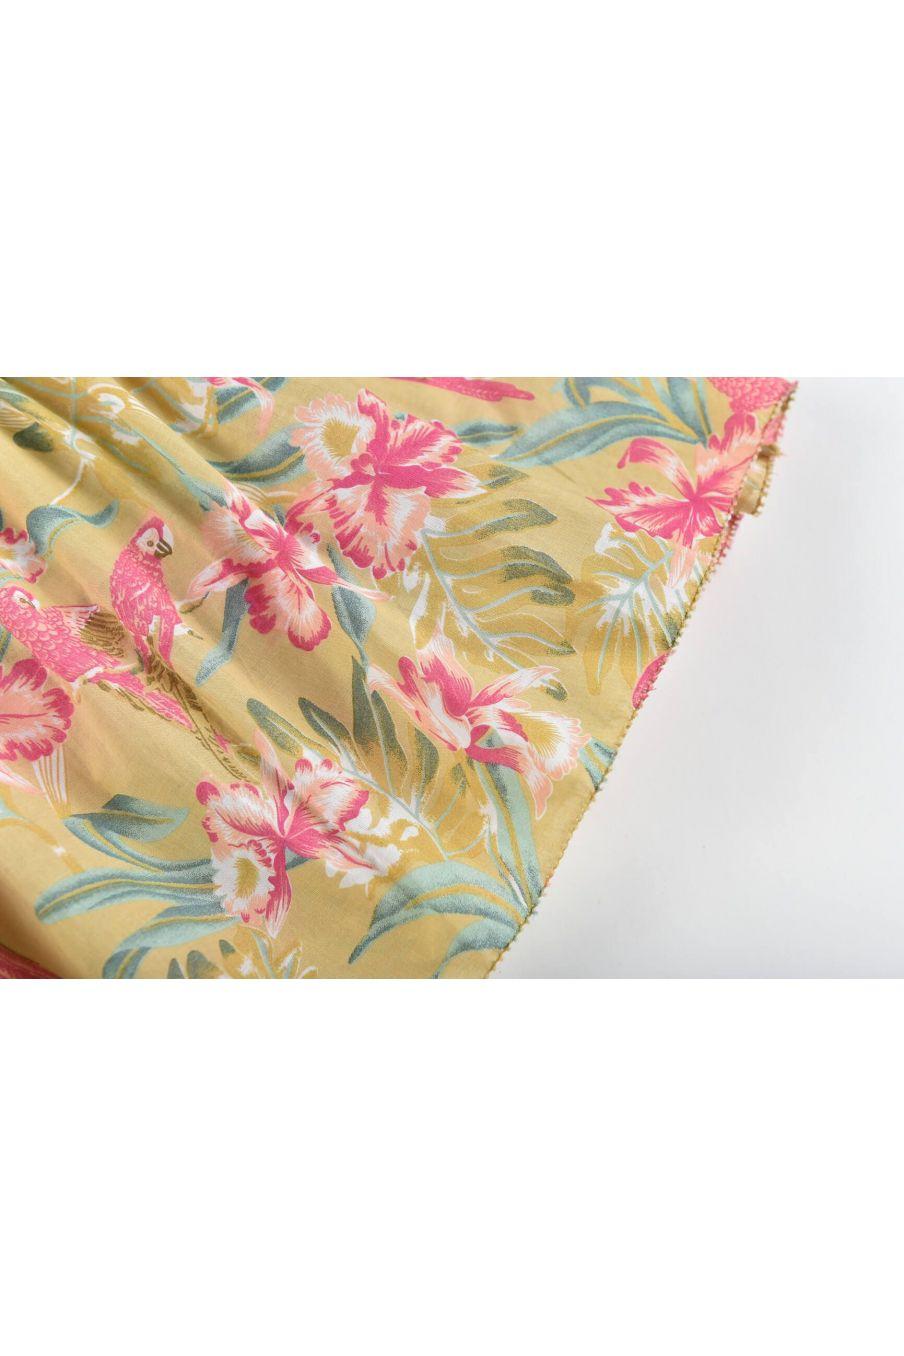 boheme chic vintage robe fille marceline soft honey parrots